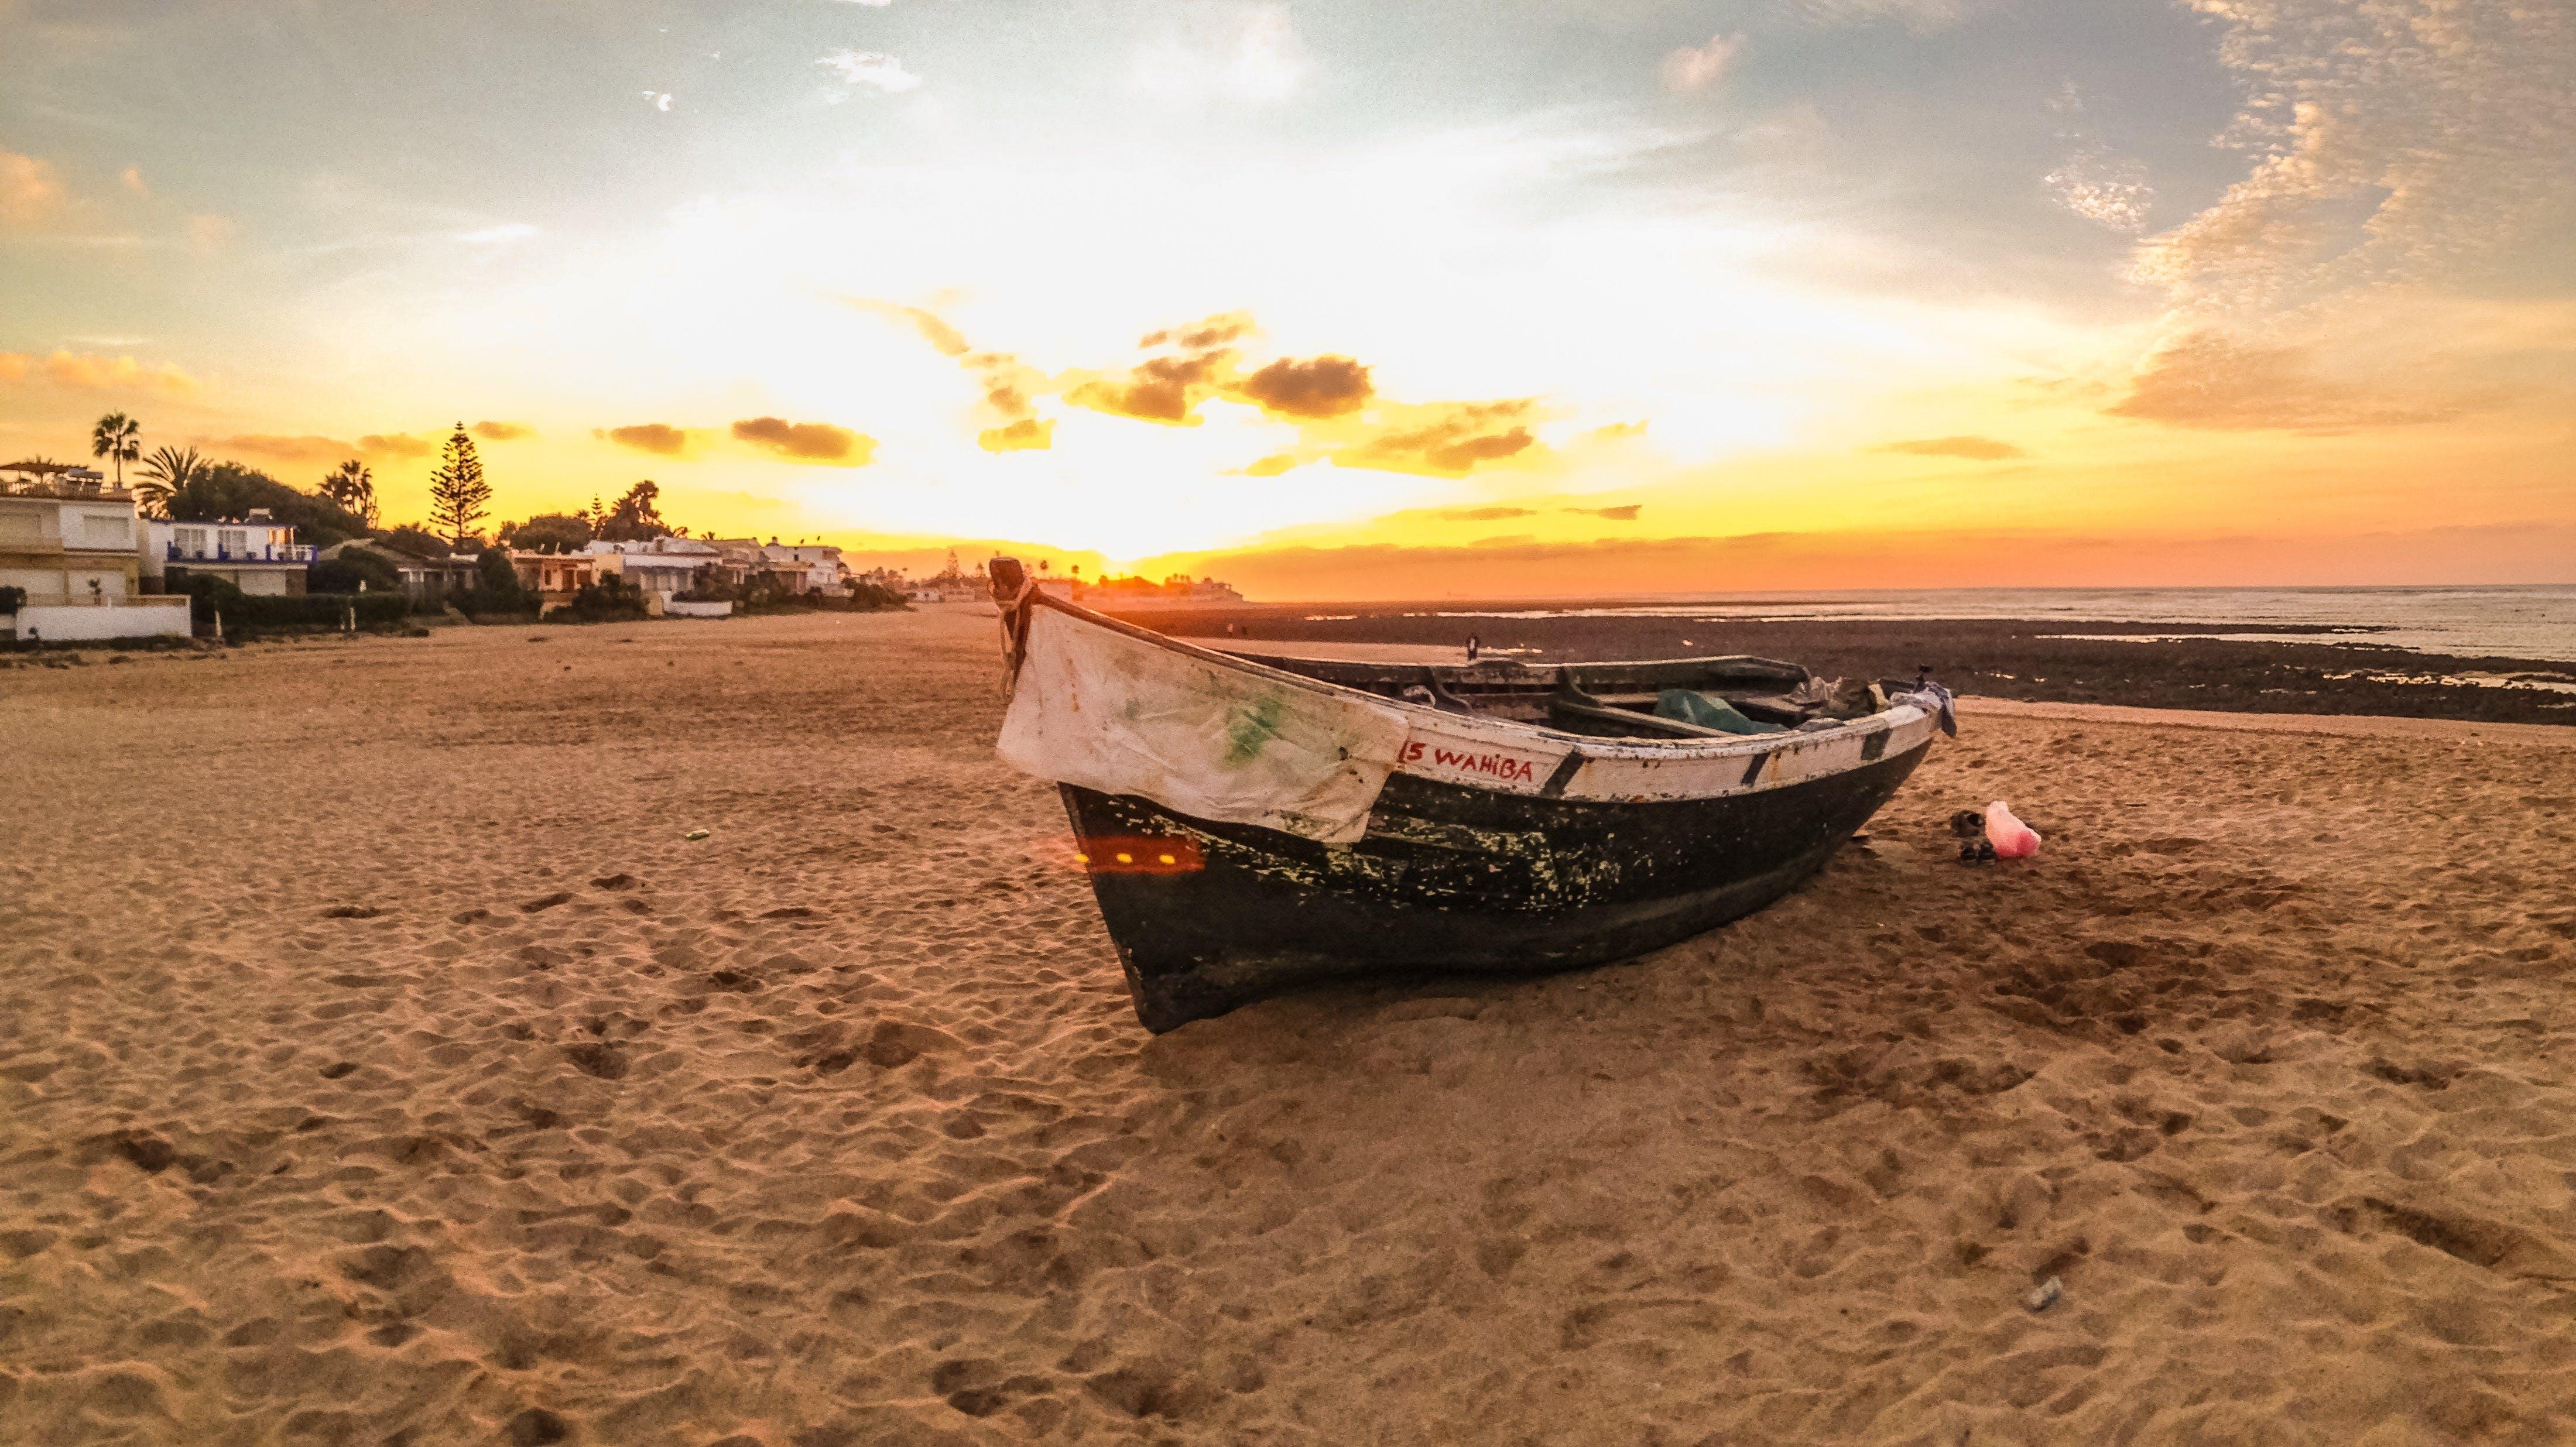 Free stock photo of beach, boat, fishing boat